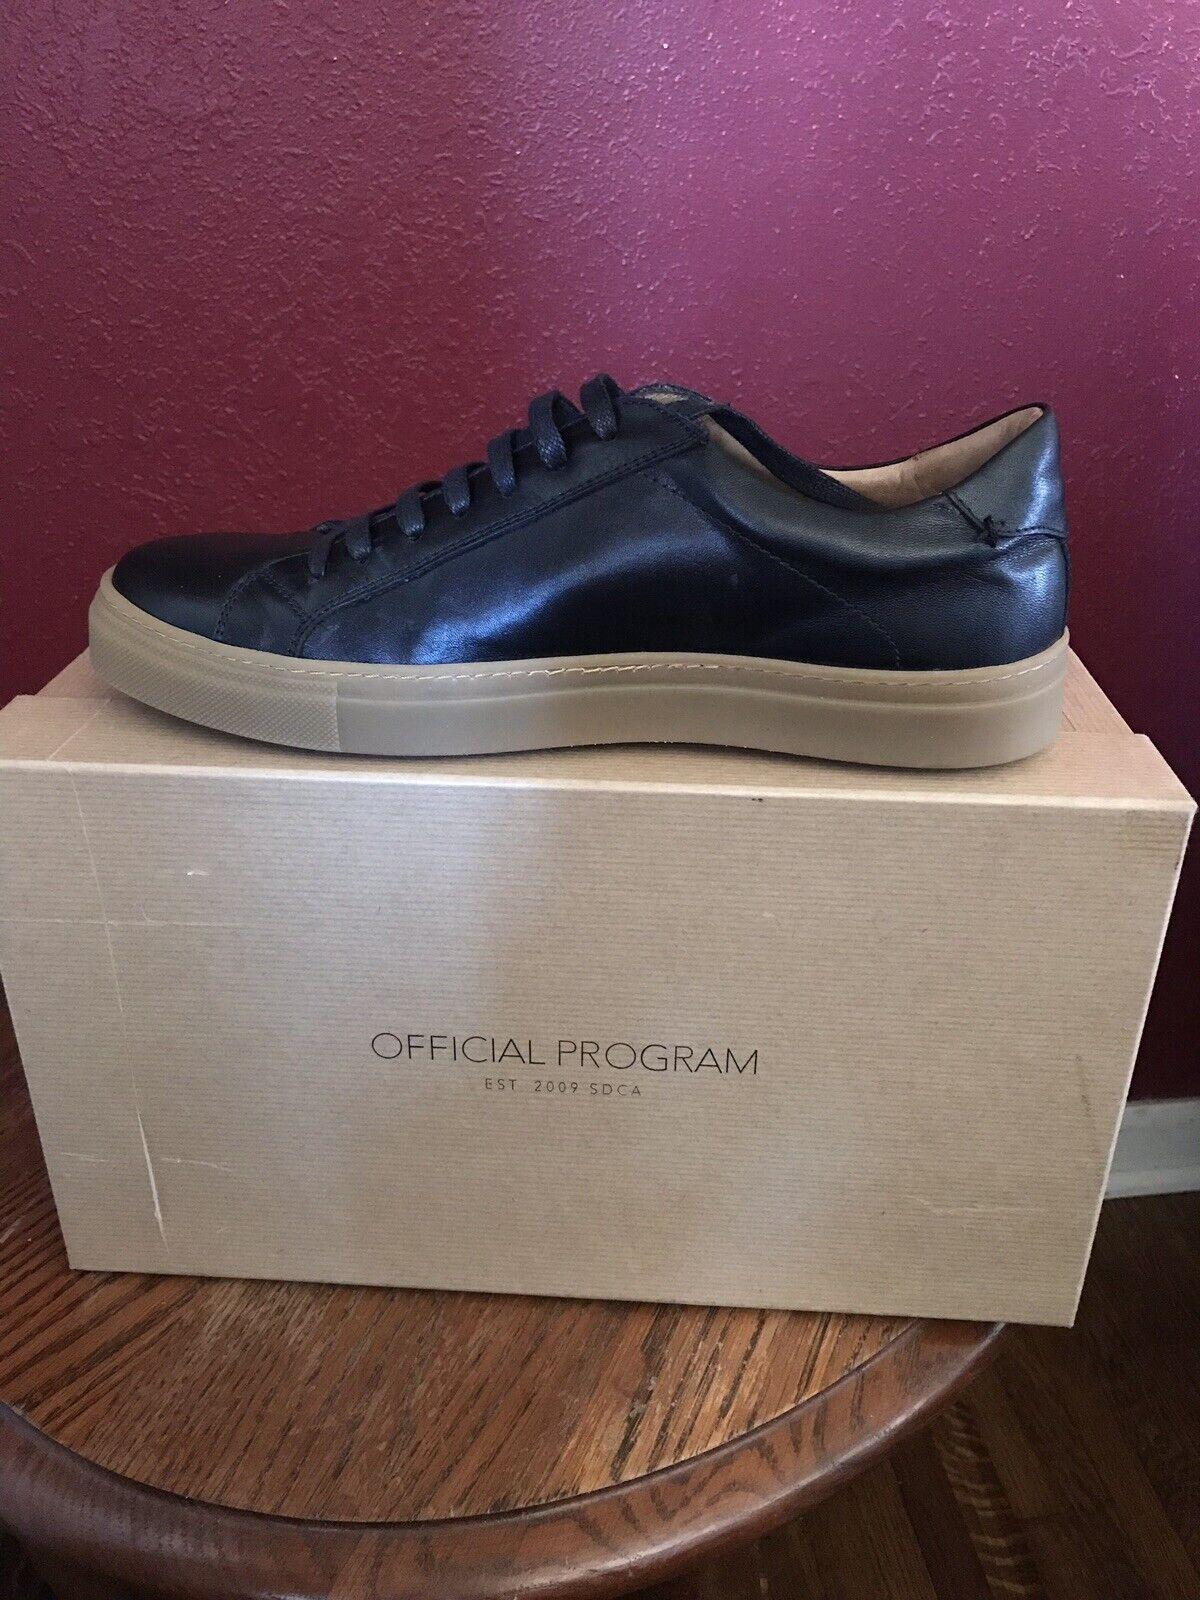 Official Program shoes Black 8.5 Mens